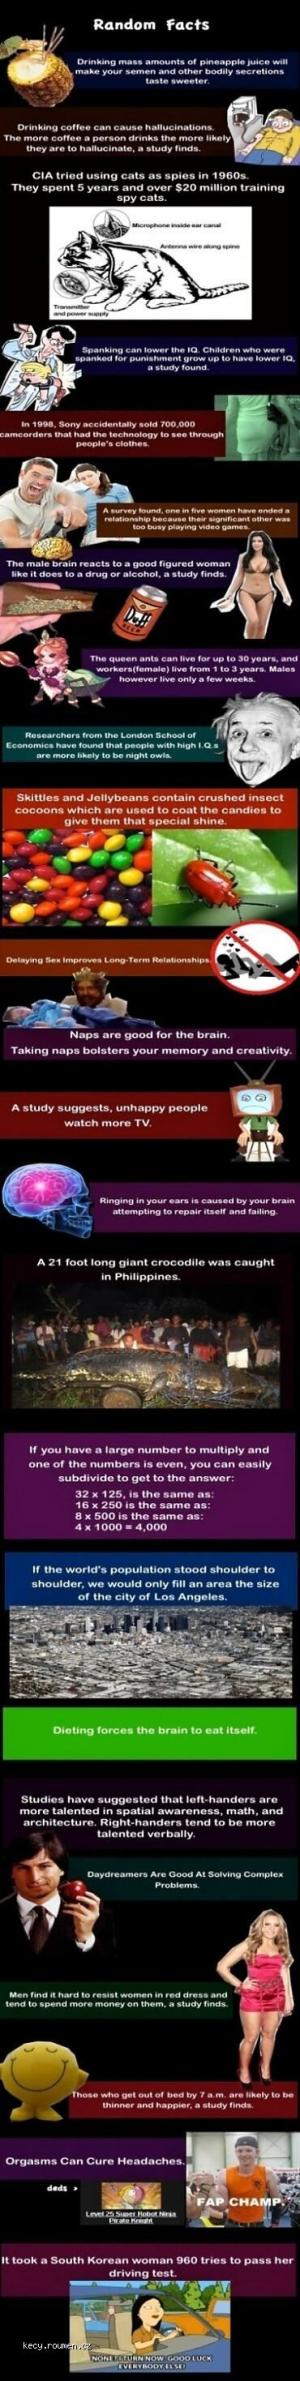 X Random Facts